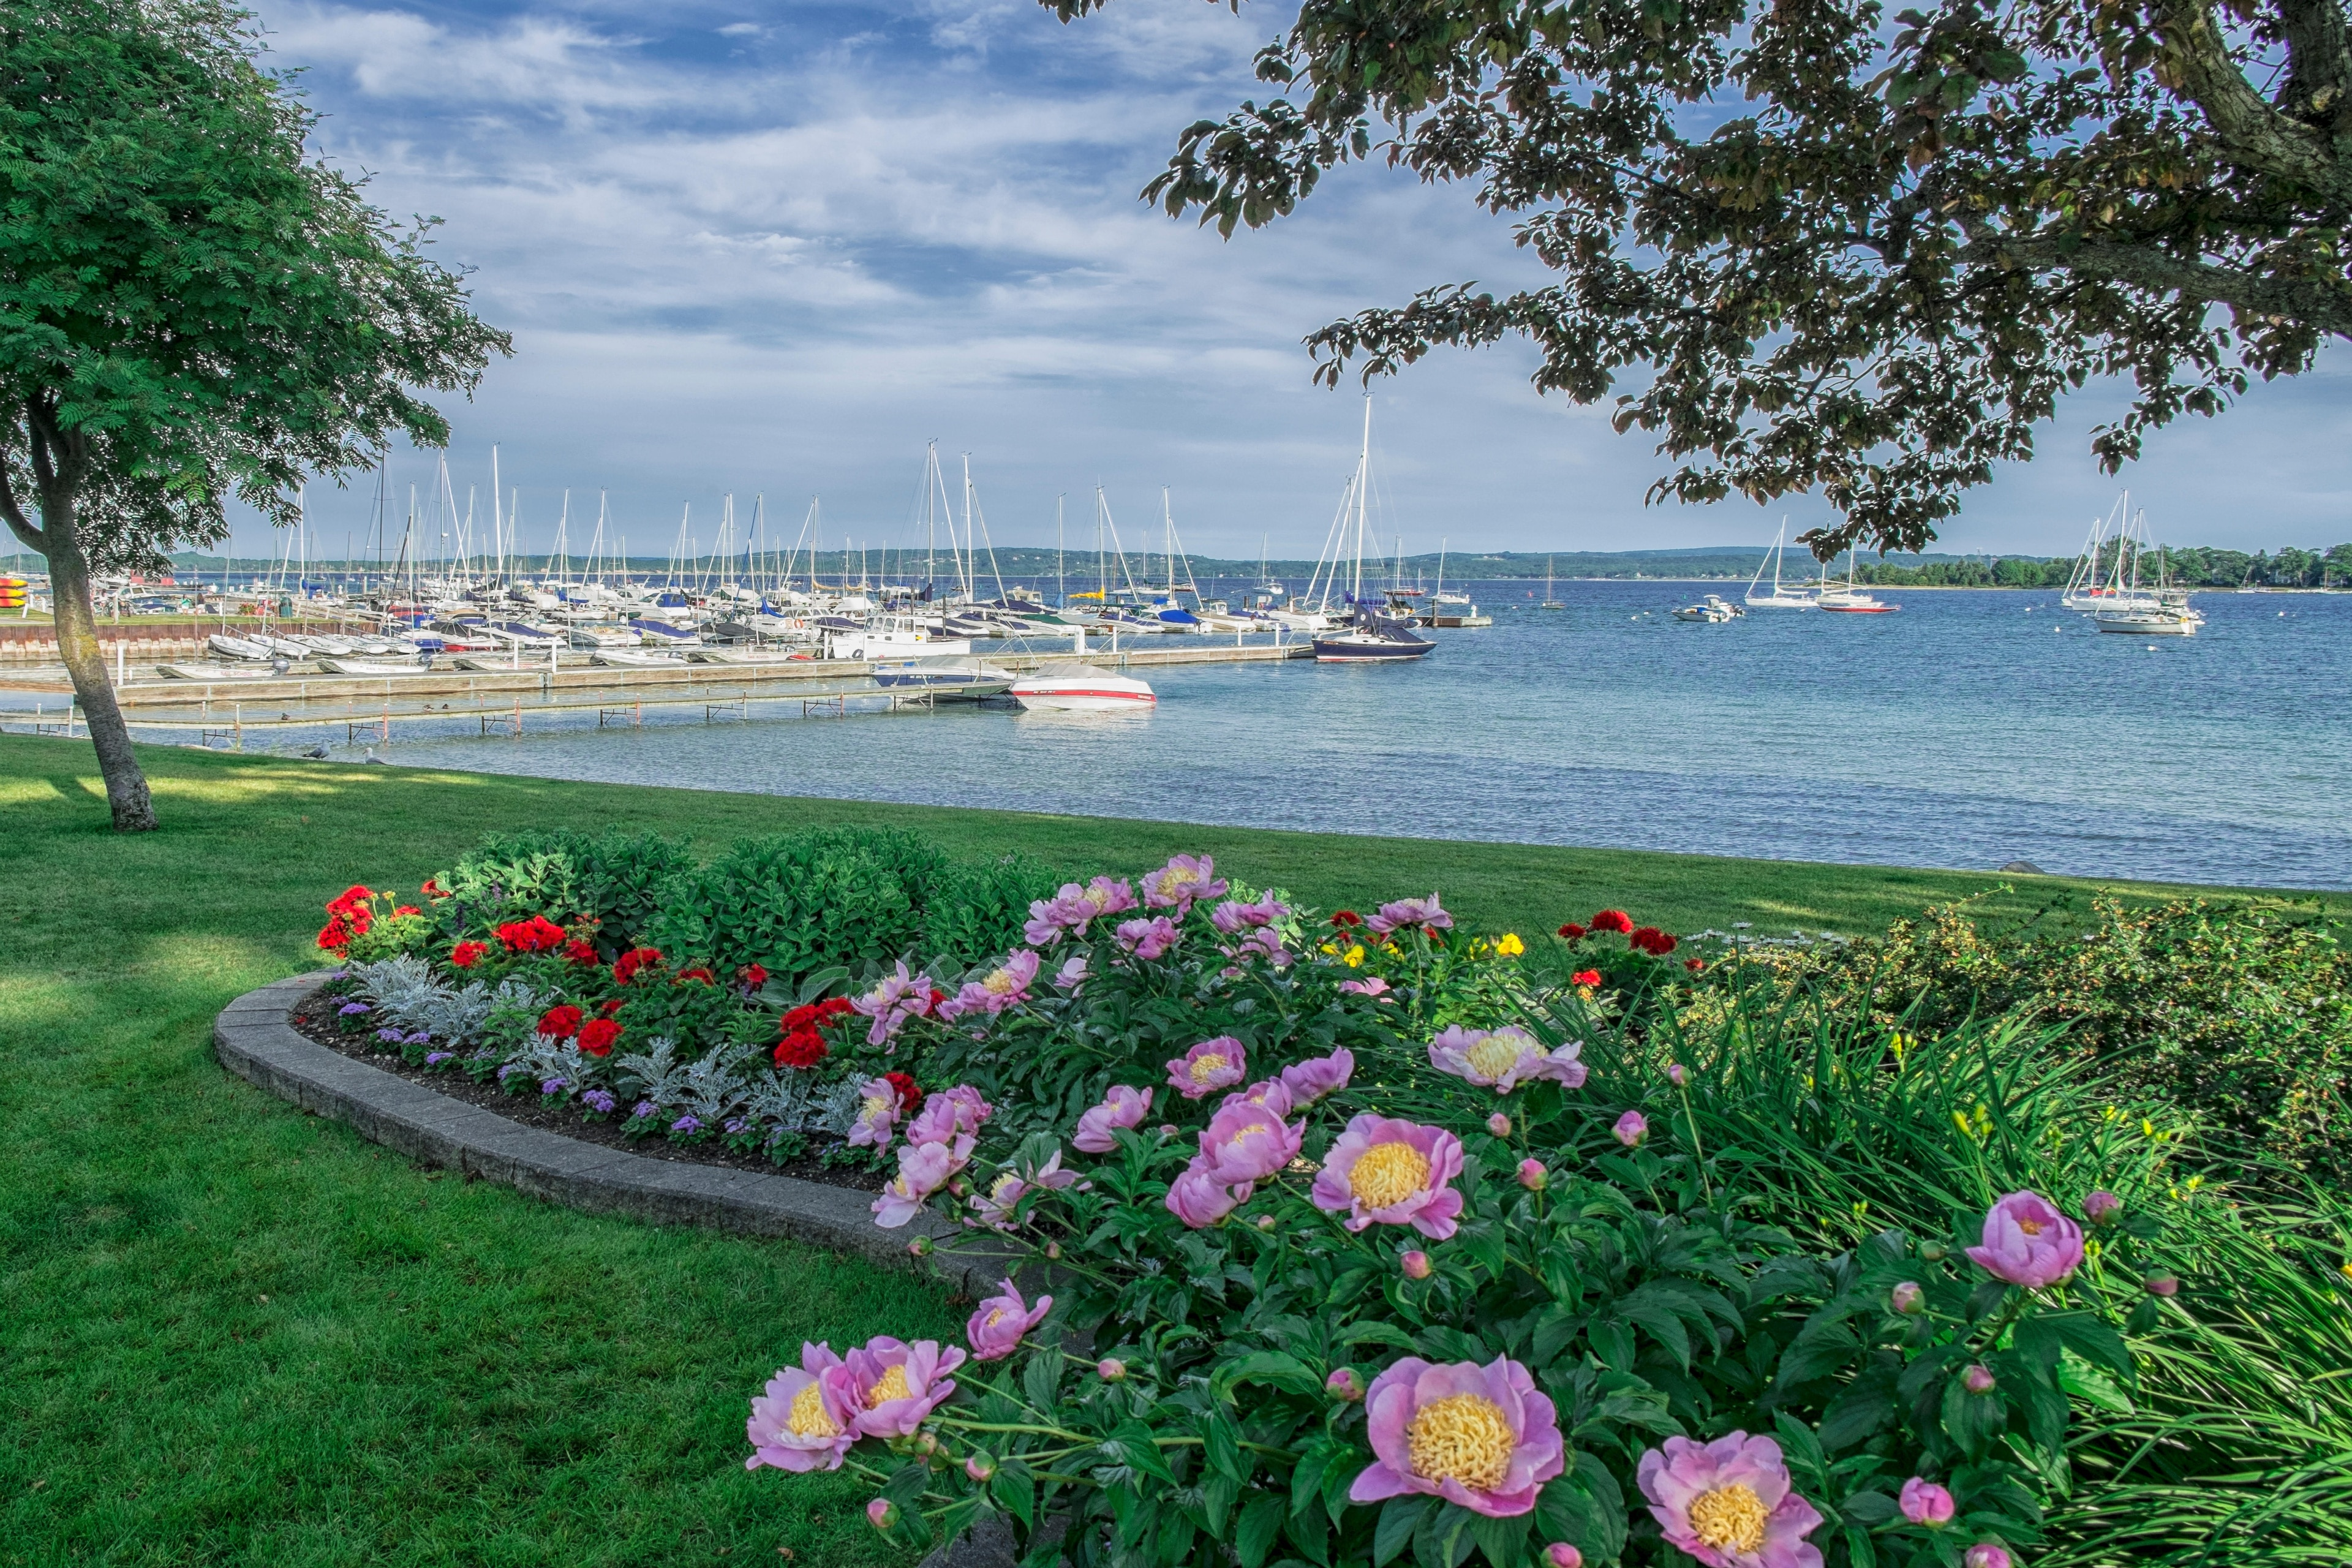 Harbor Springs, Michigan, United States of America